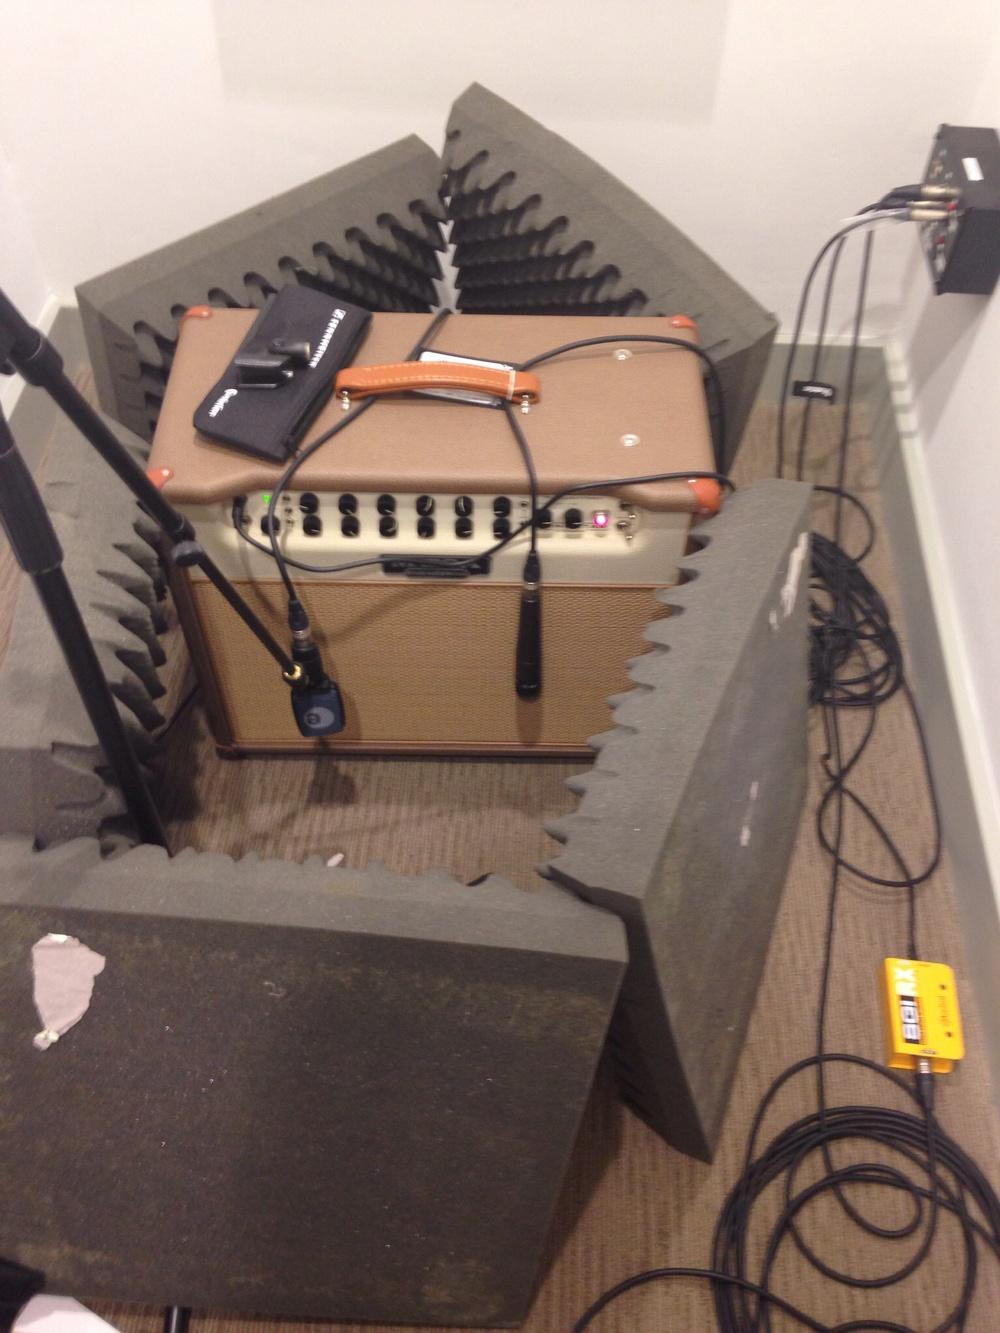 Mesa Lonestar Setup for Session 1 (Before I blew the output tube!)